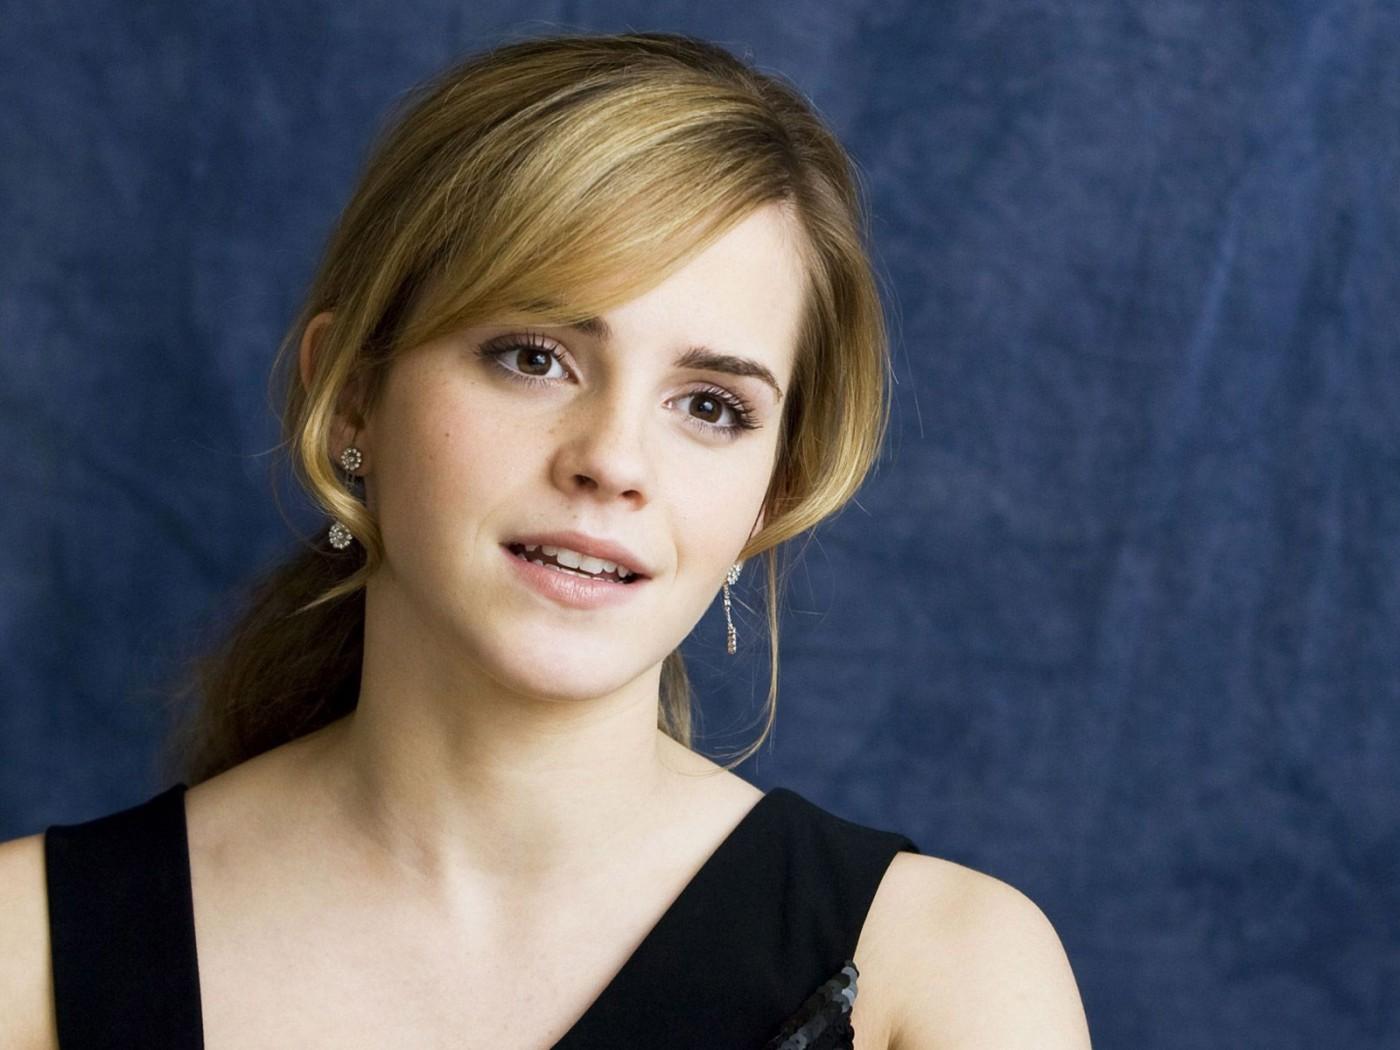 http://1.bp.blogspot.com/-wN-DcxsG5Do/TquXLMSuxmI/AAAAAAAAD0M/6xQ-e0Kee28/s1600/Emma+Watson5.jpg